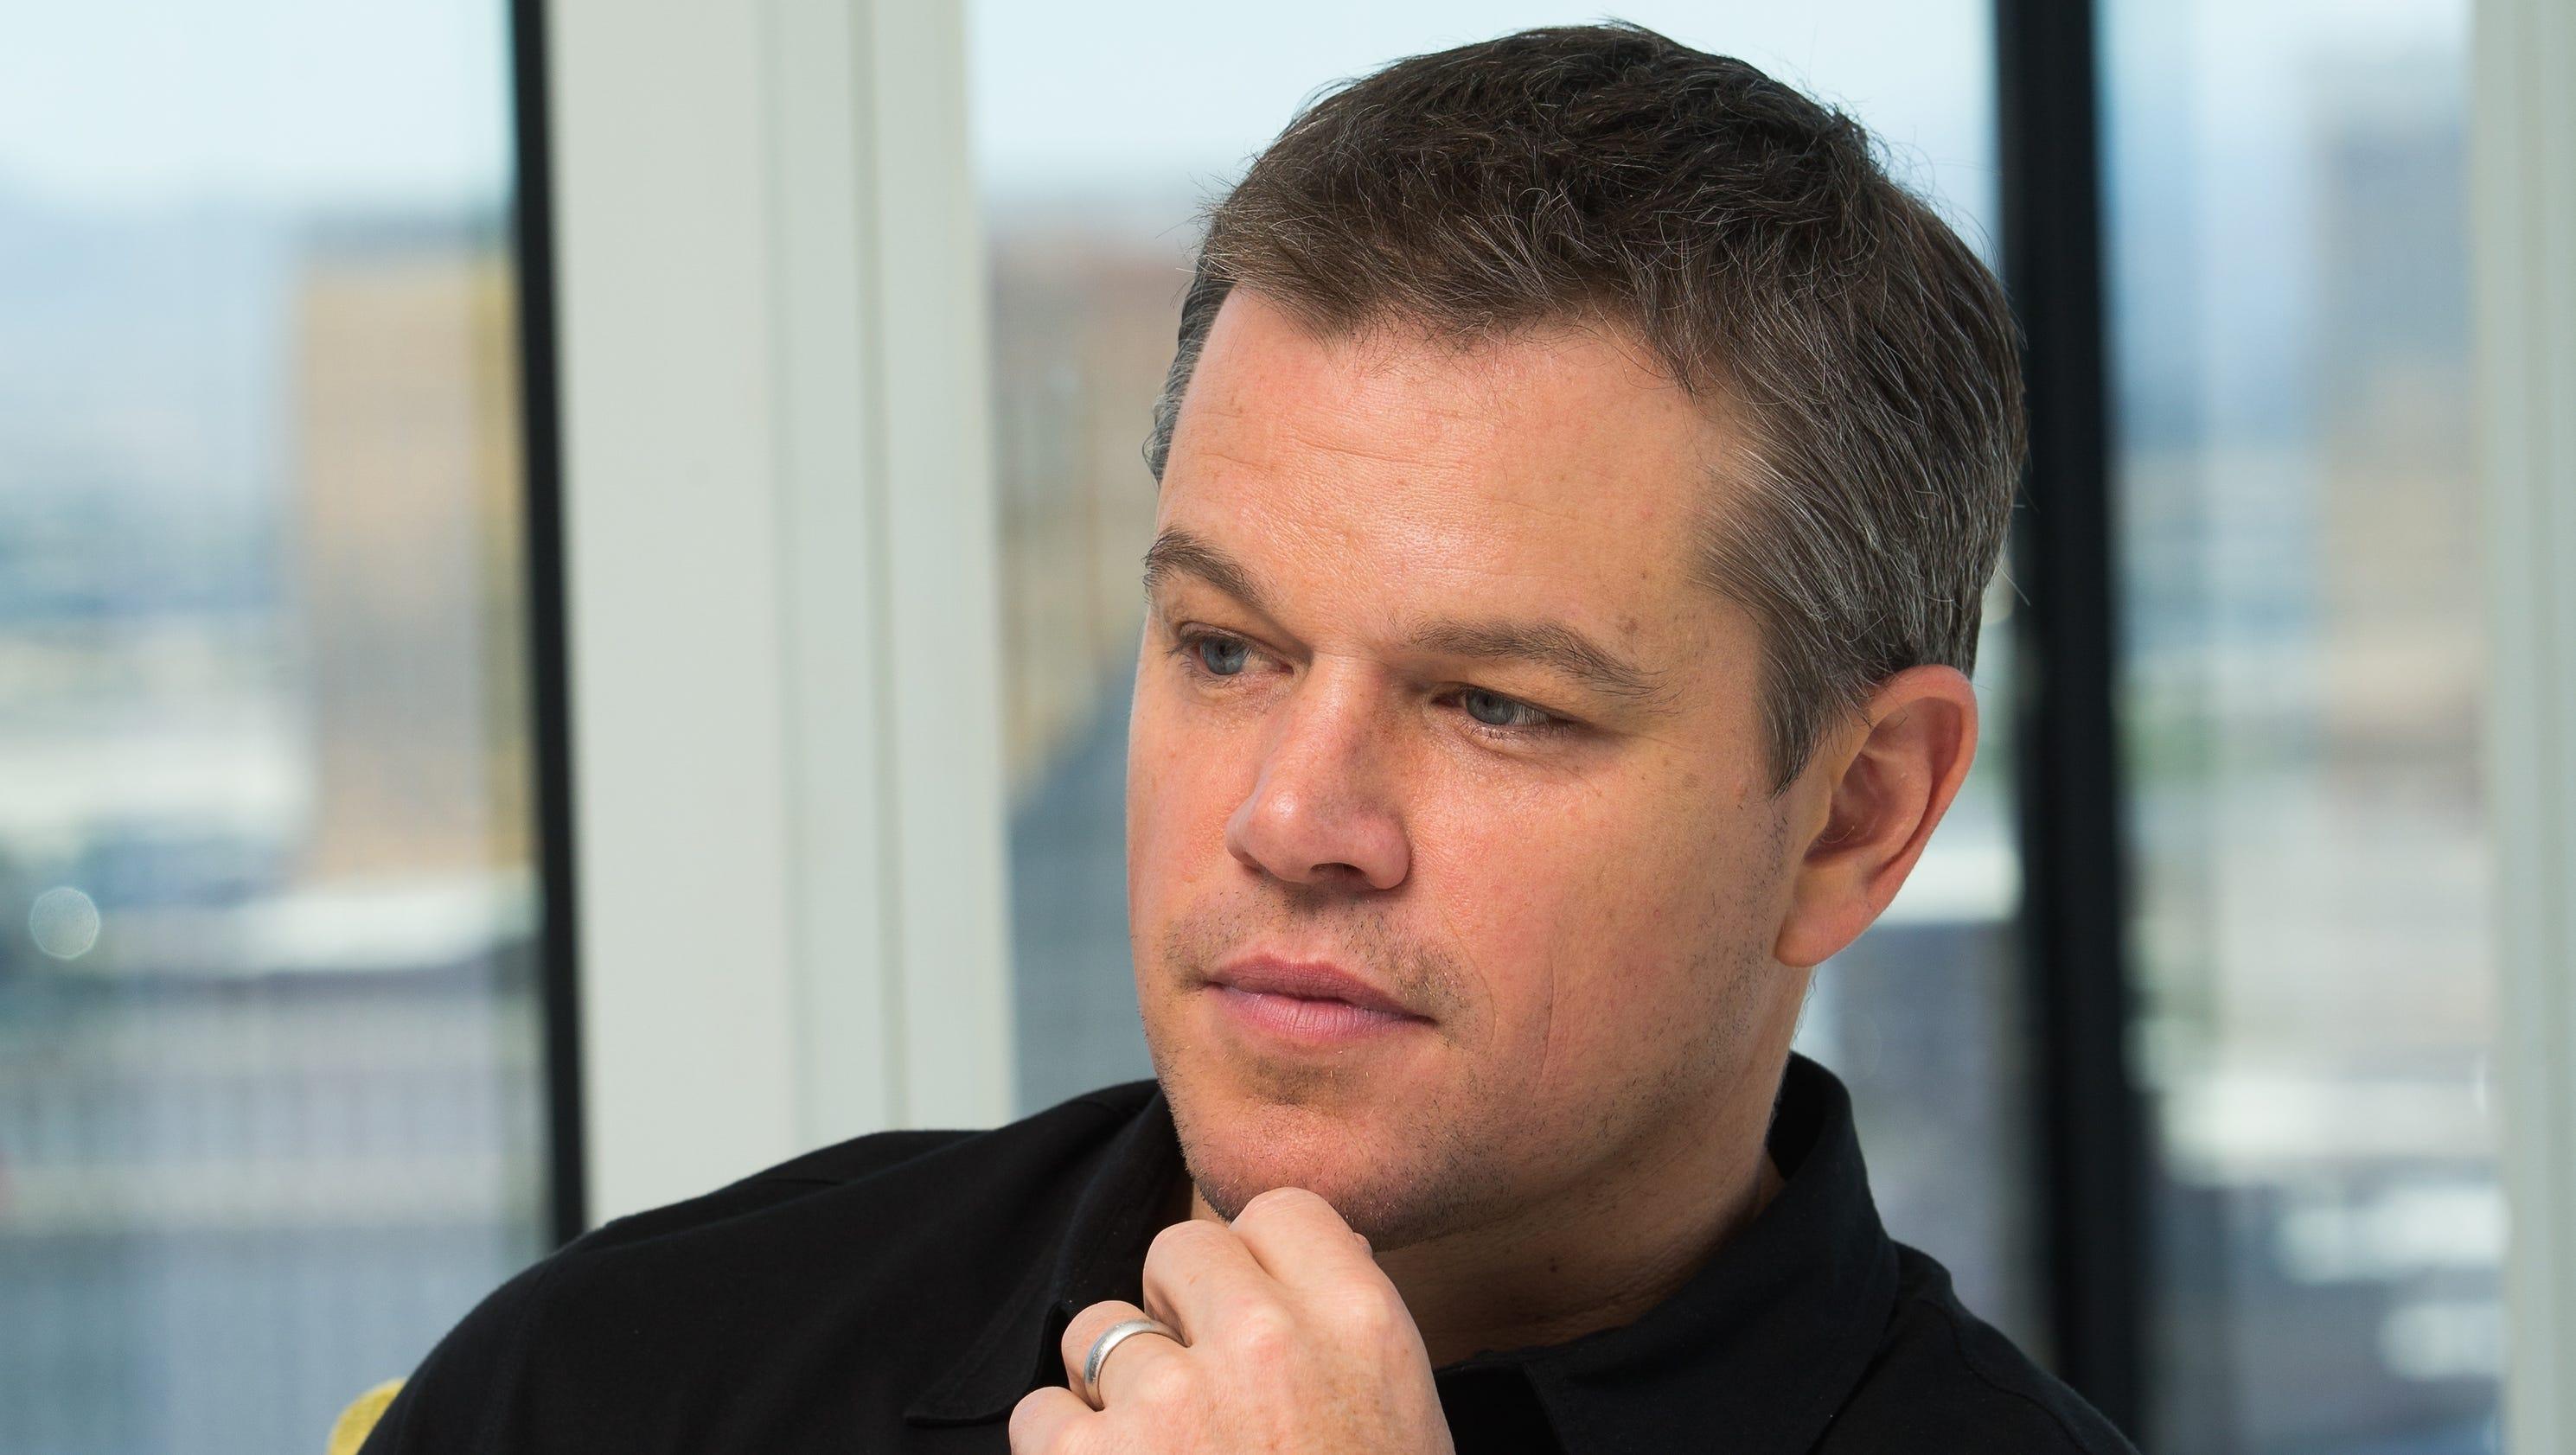 Straight Up Hollywood: From Matt Damon to what it's like covering the RNC Matt Damon